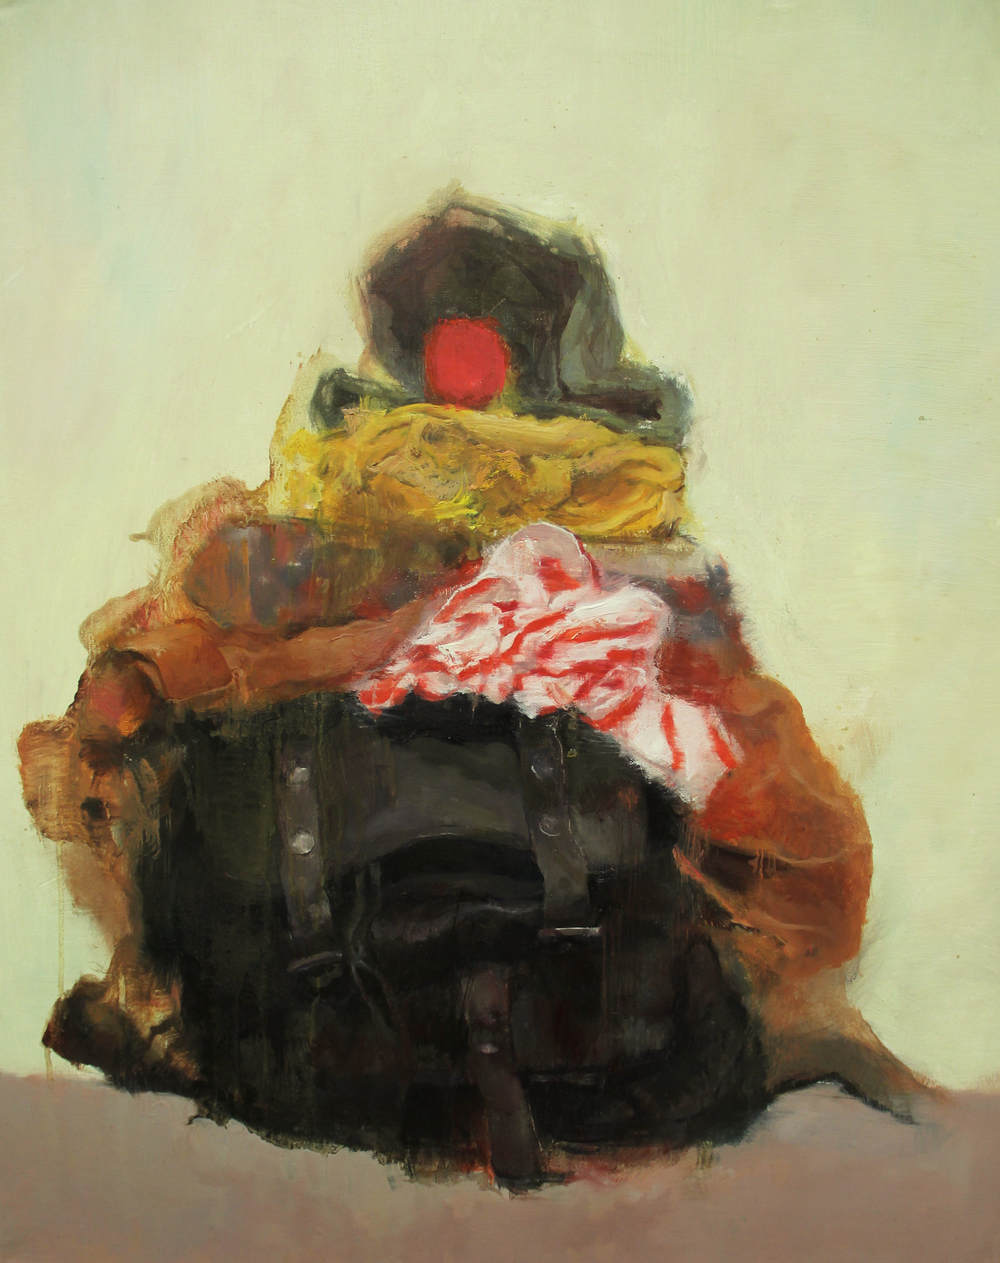 Still life  , painting, oil on linen, 70 x 50cm, 2012